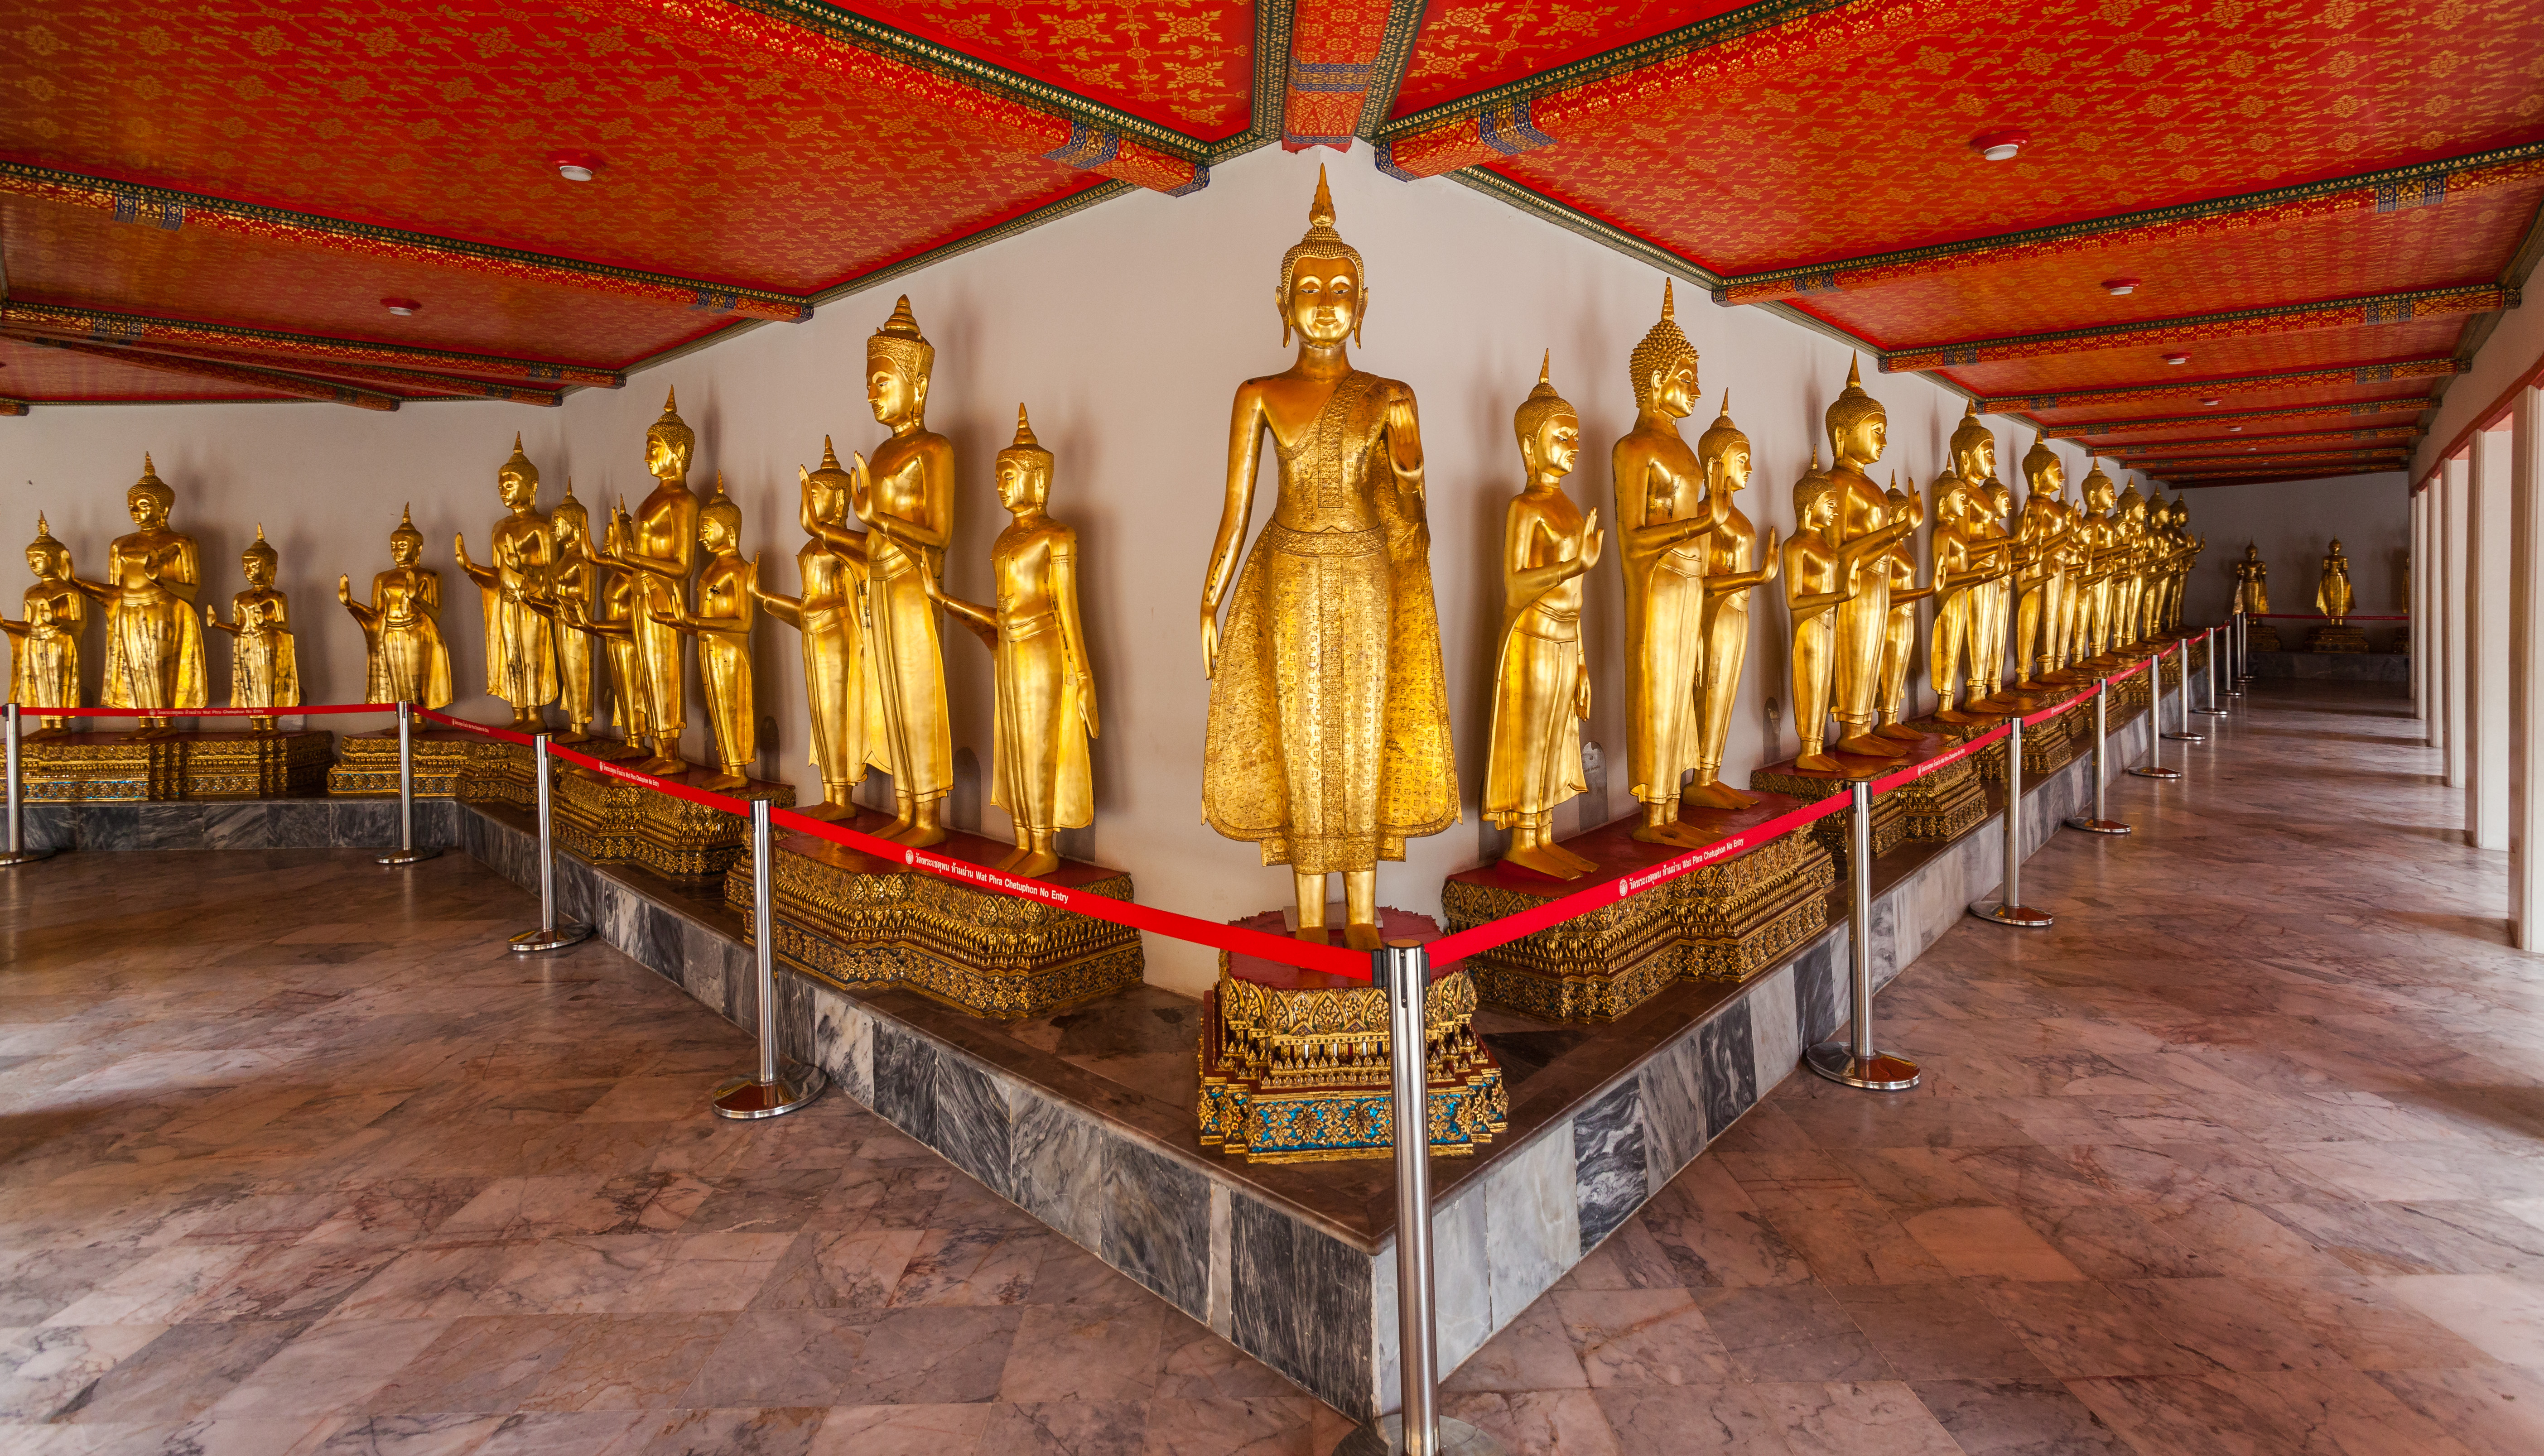 File:Wat Pho, Bangkok, Tailandia, 2013-08-22, DD 22.jpg